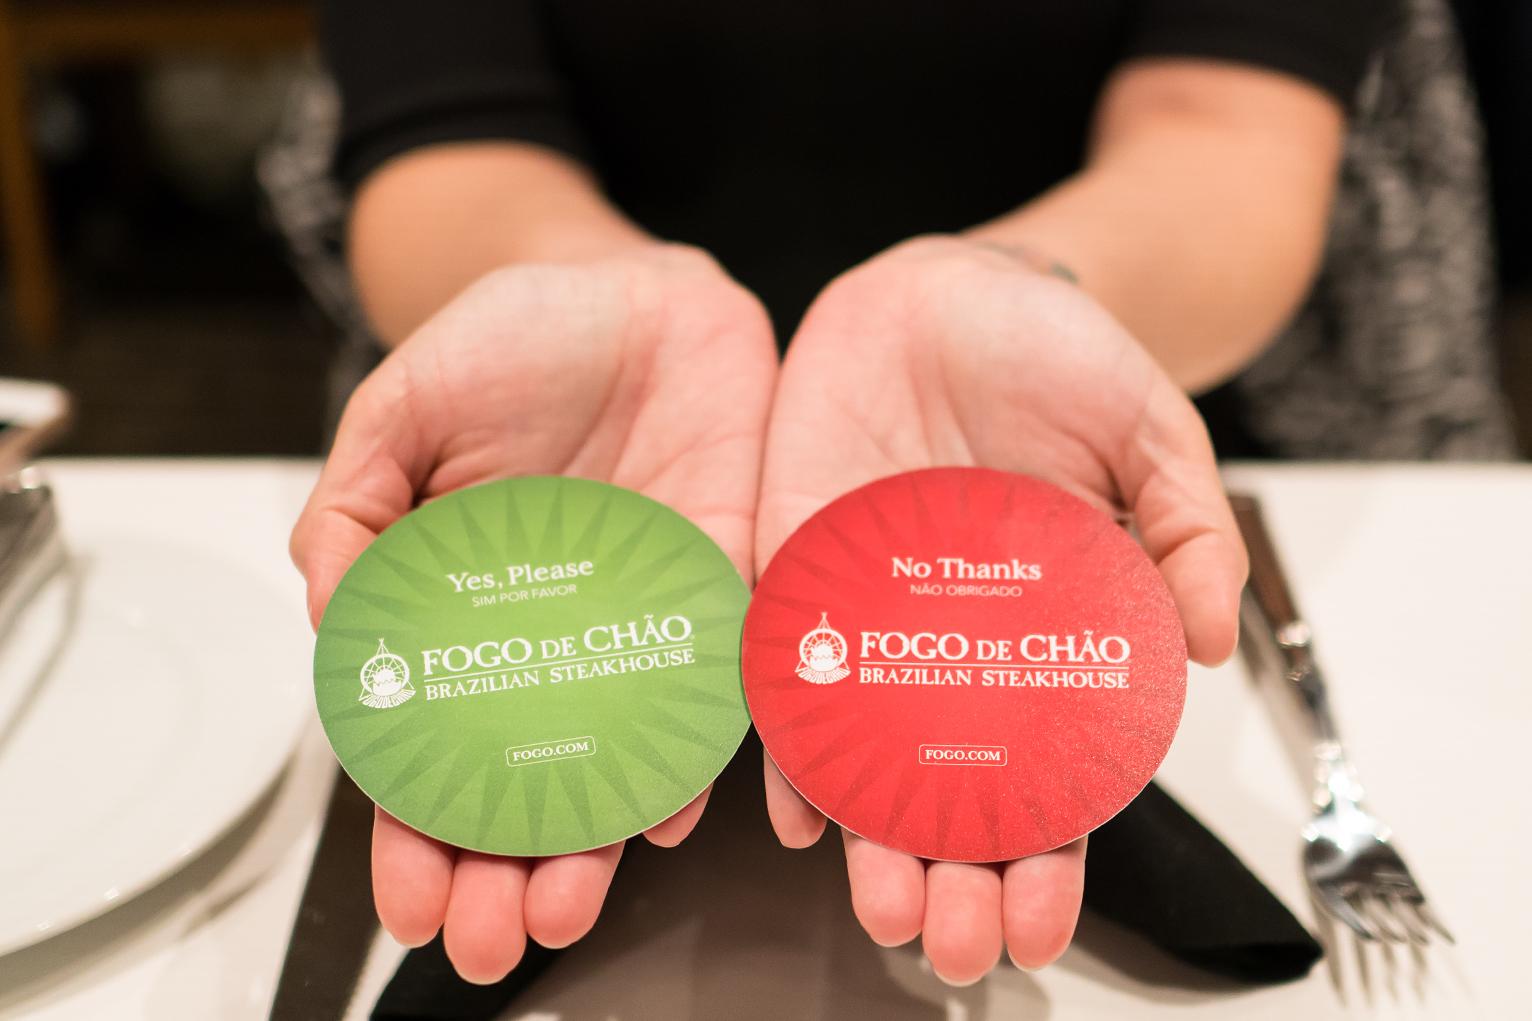 Fogo de Chao flip cards